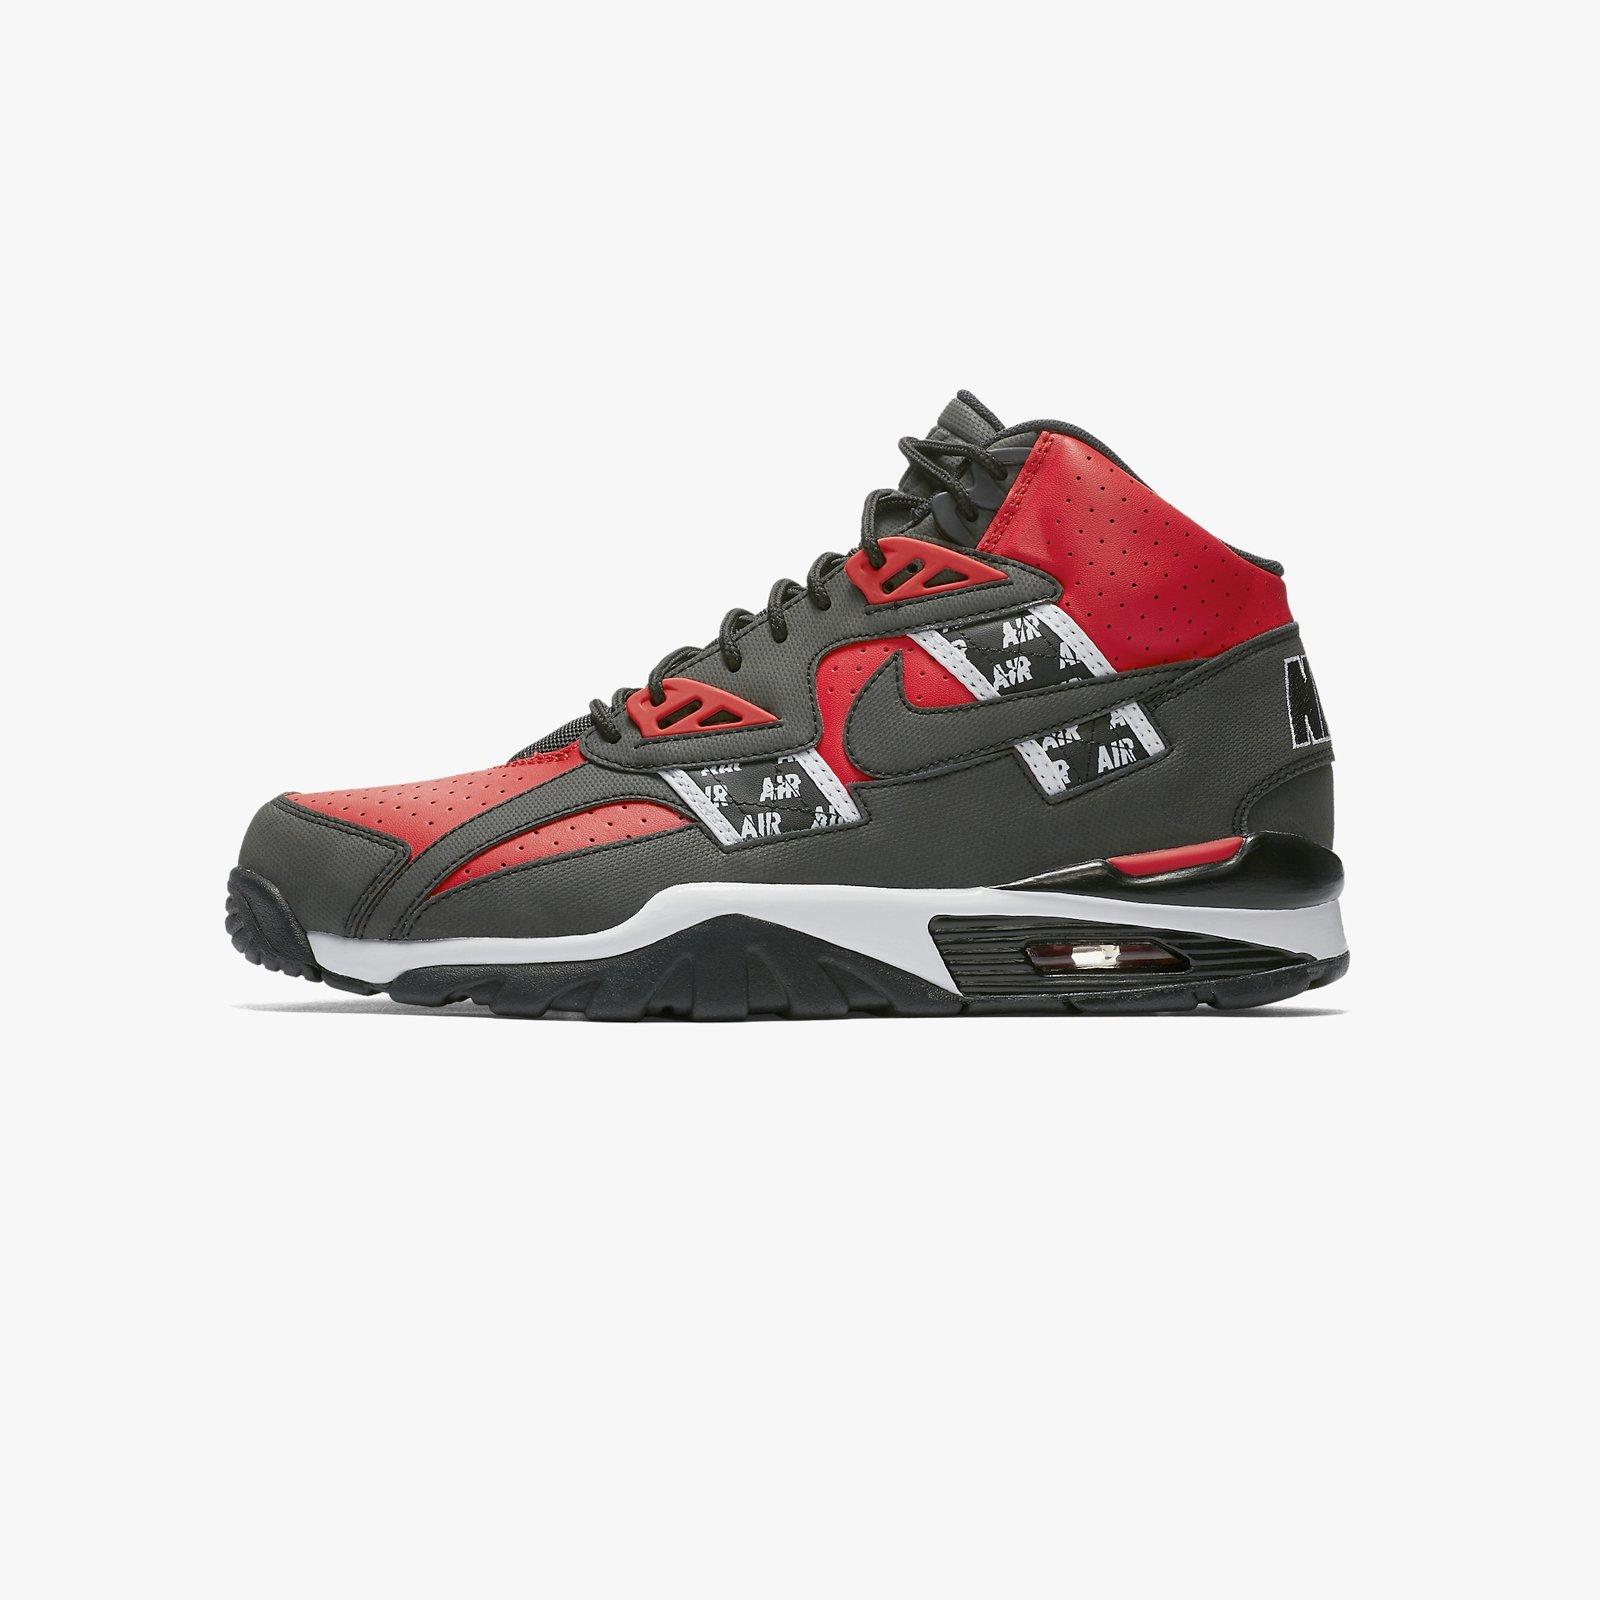 Nike Air Trainer SC High SOA - Aq5098-600 - Sneakersnstuff ... 2b7002347